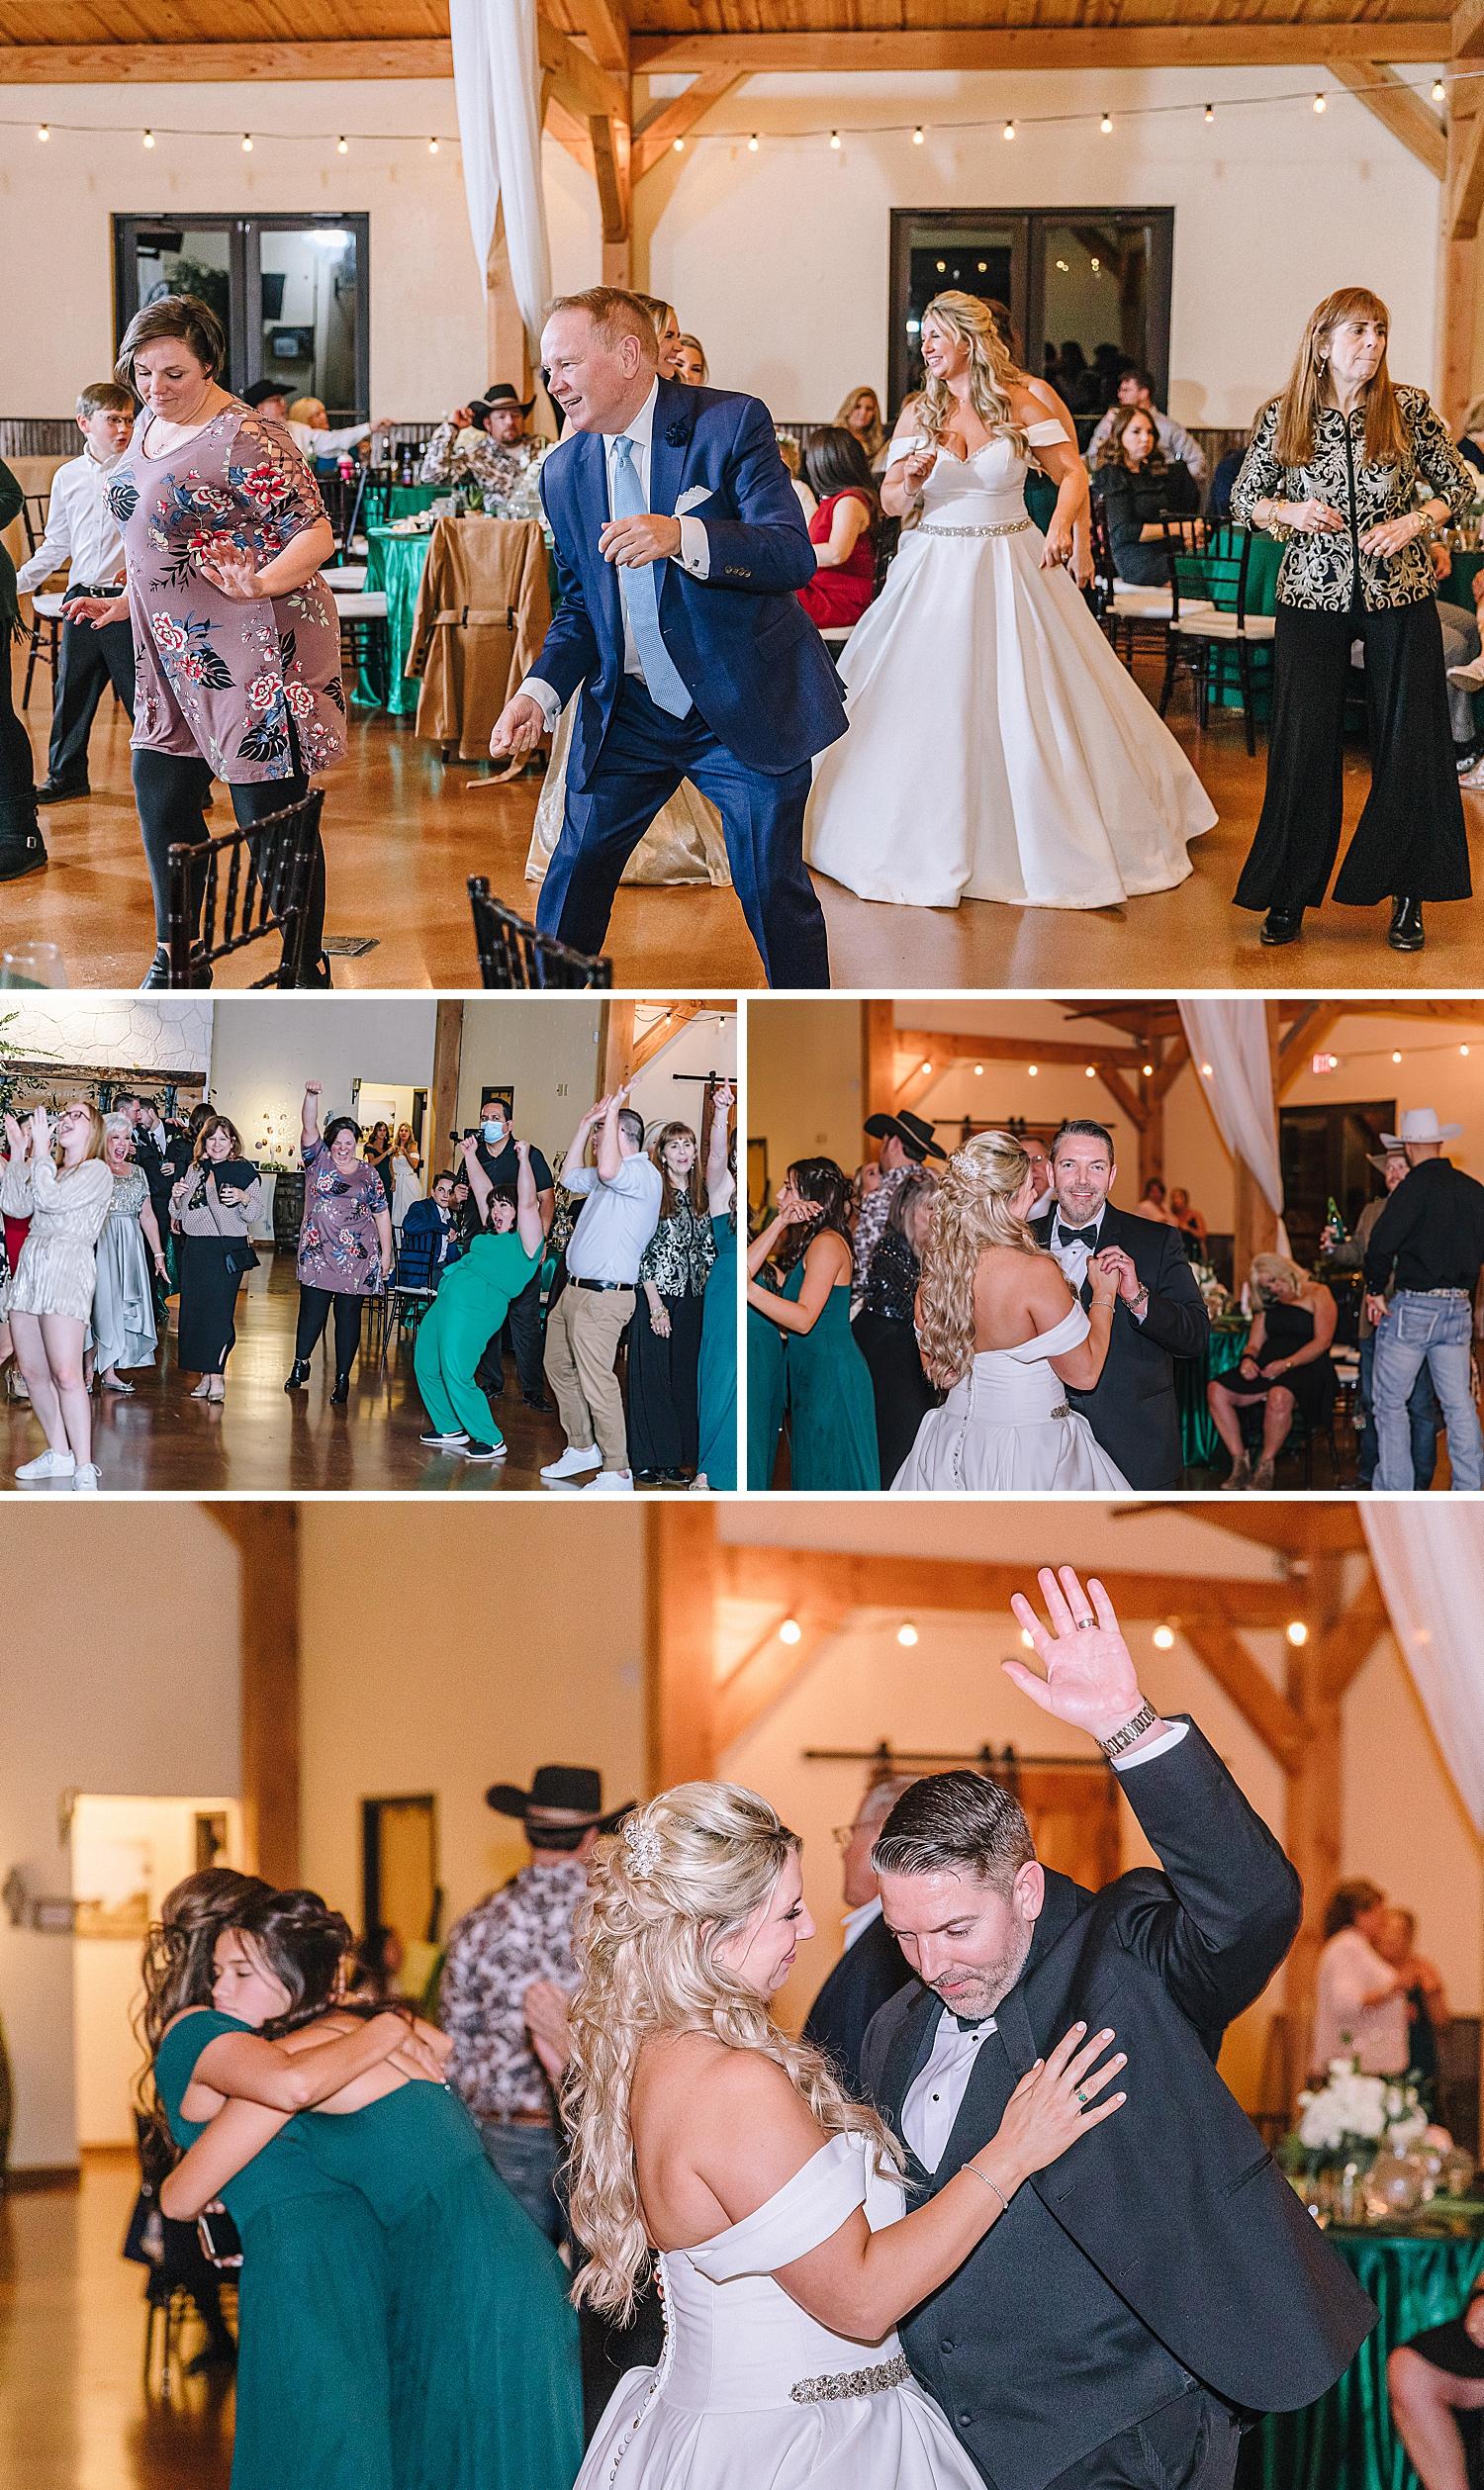 Magnolia-Halle-Wedding-San-Antonio-Texas-Bride-Grom_0094.jpg